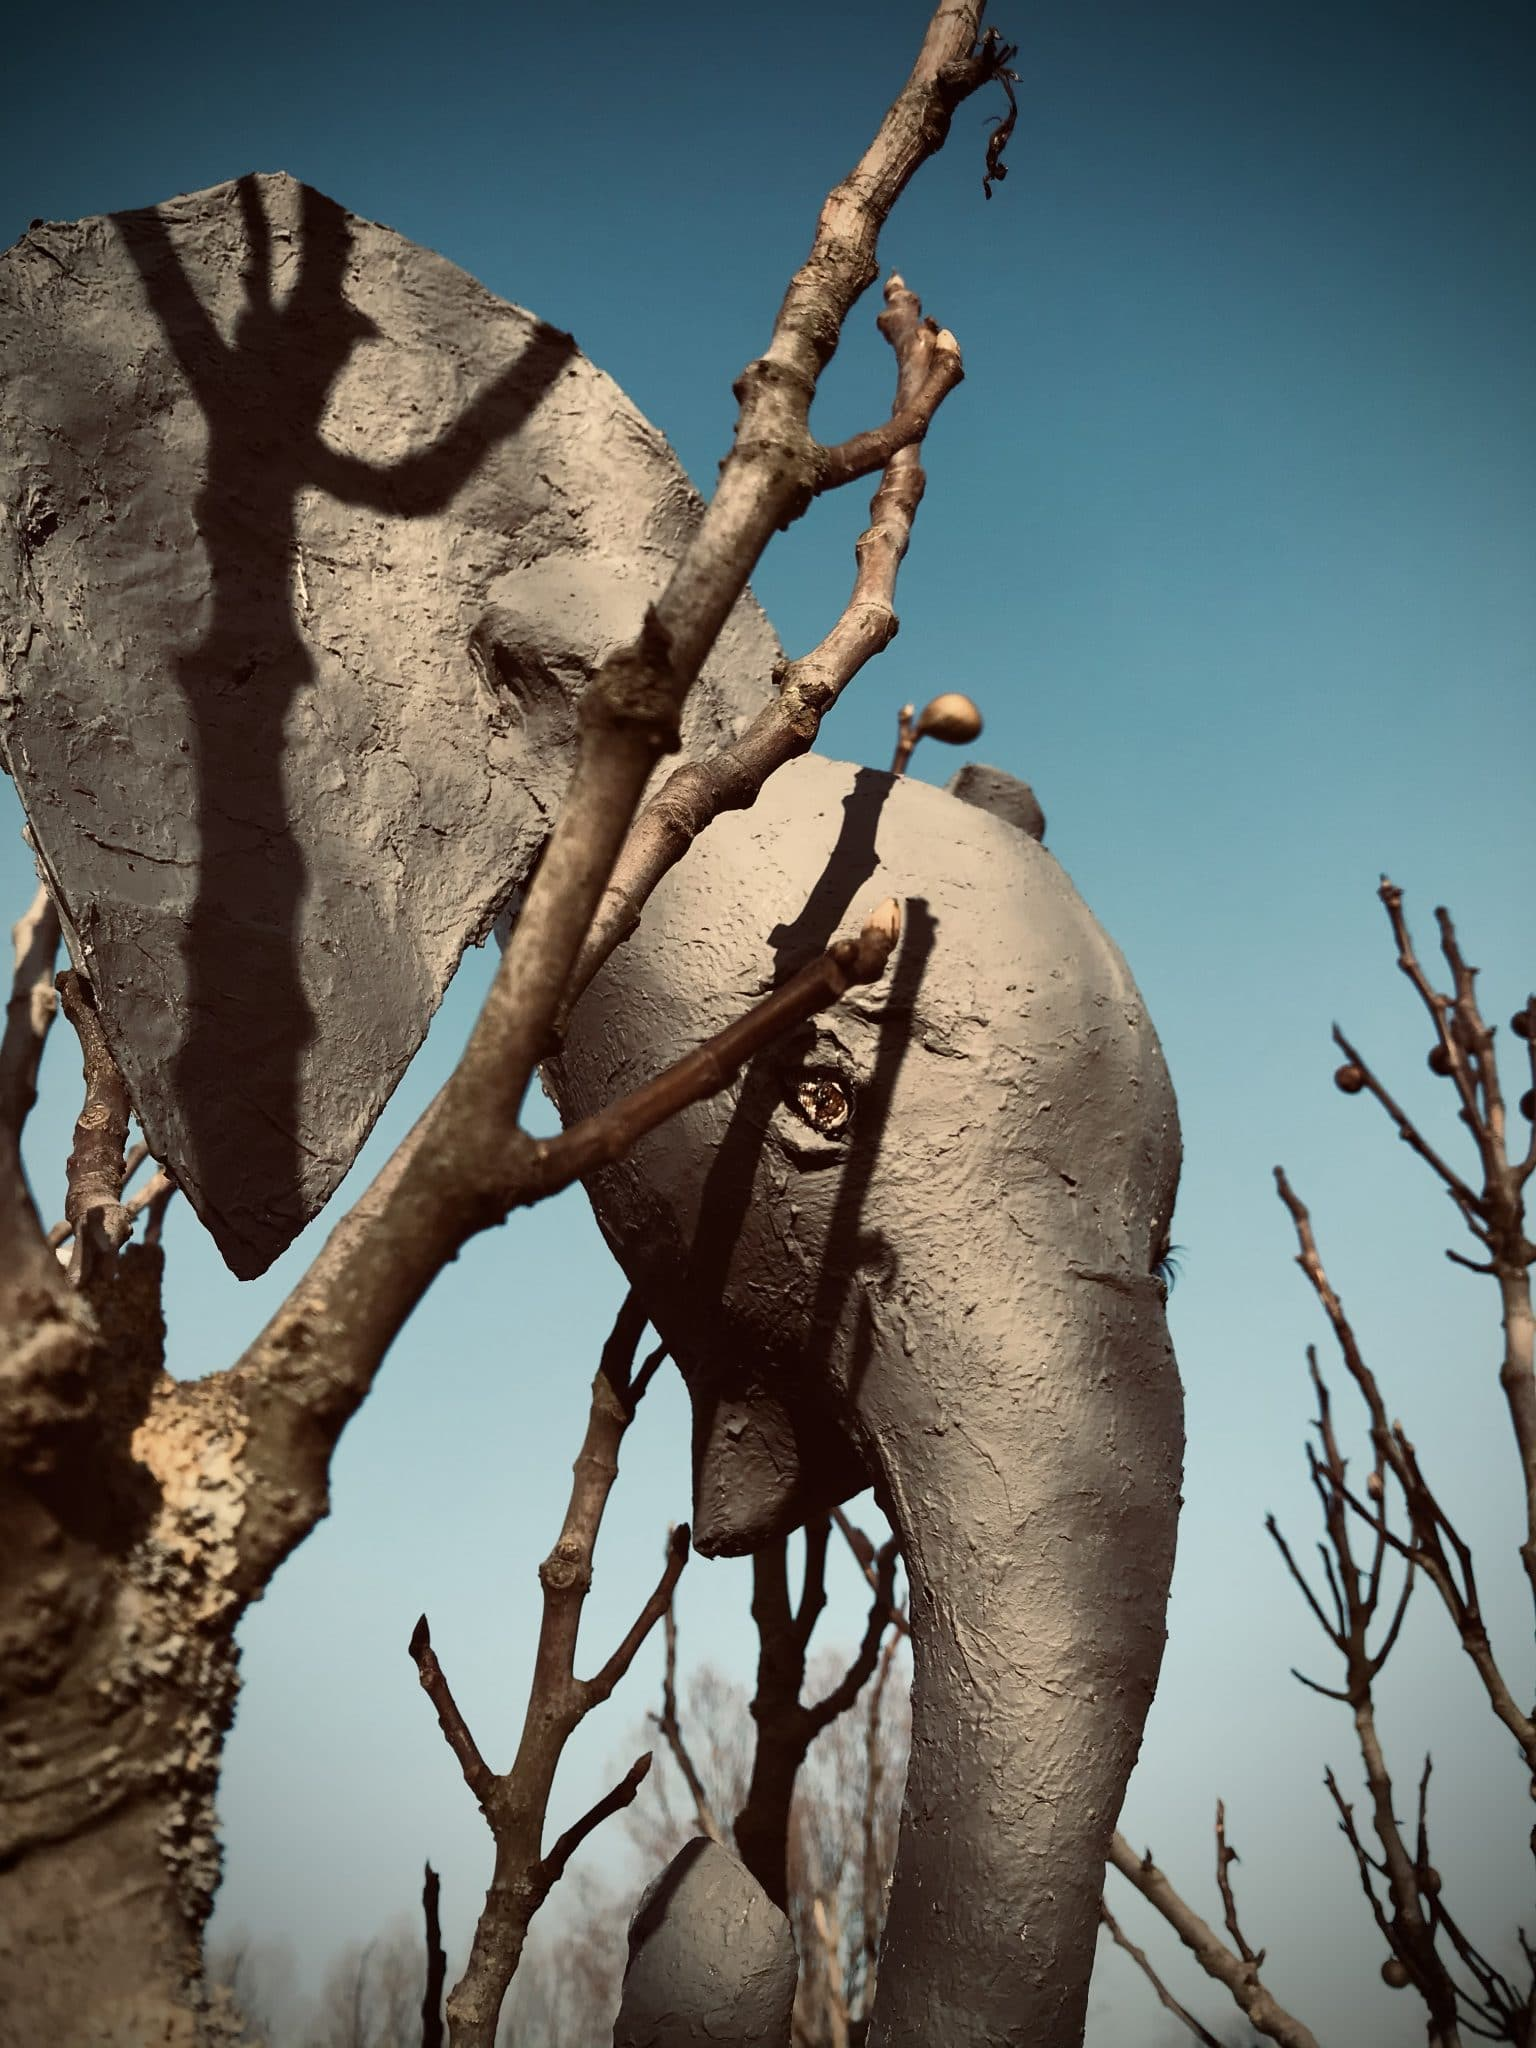 Paper mache elephant head sculpture